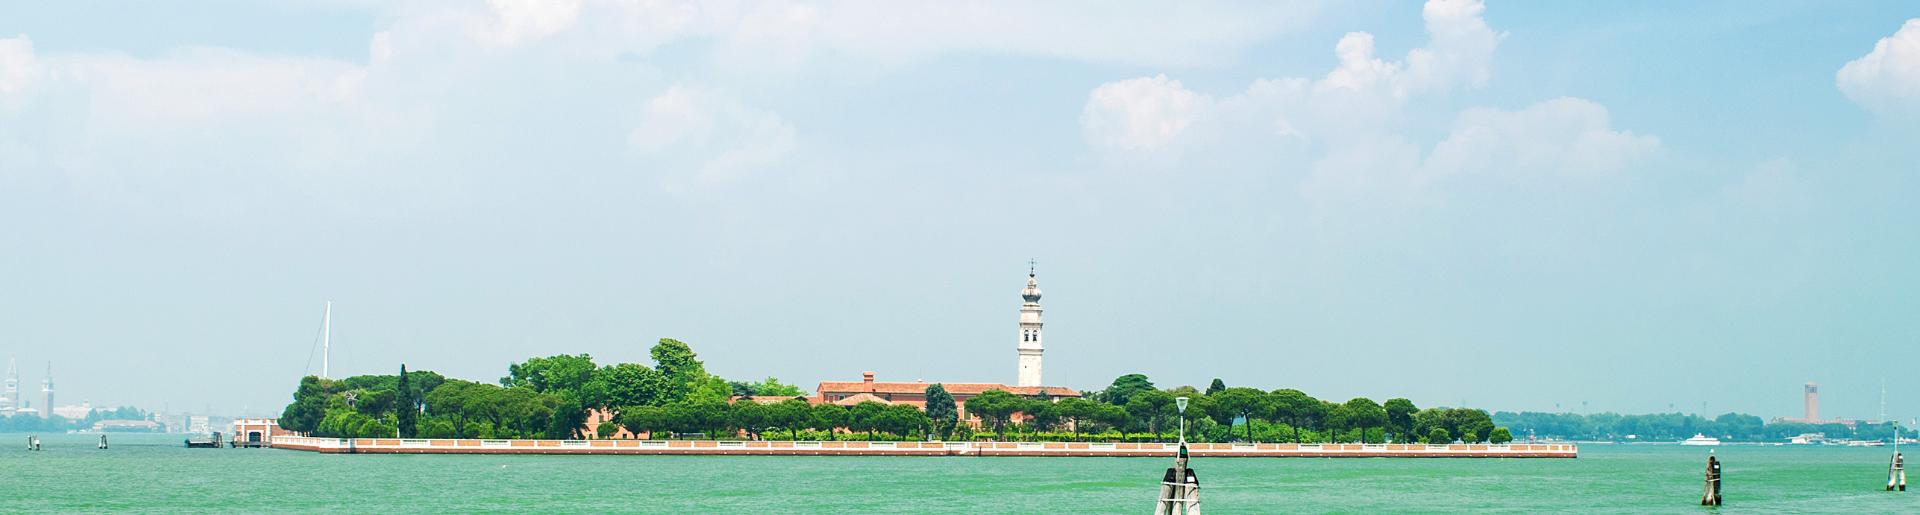 Tour Sottomarina Venezia San Lazzaro degli Armeni - Raffaello Navigazione